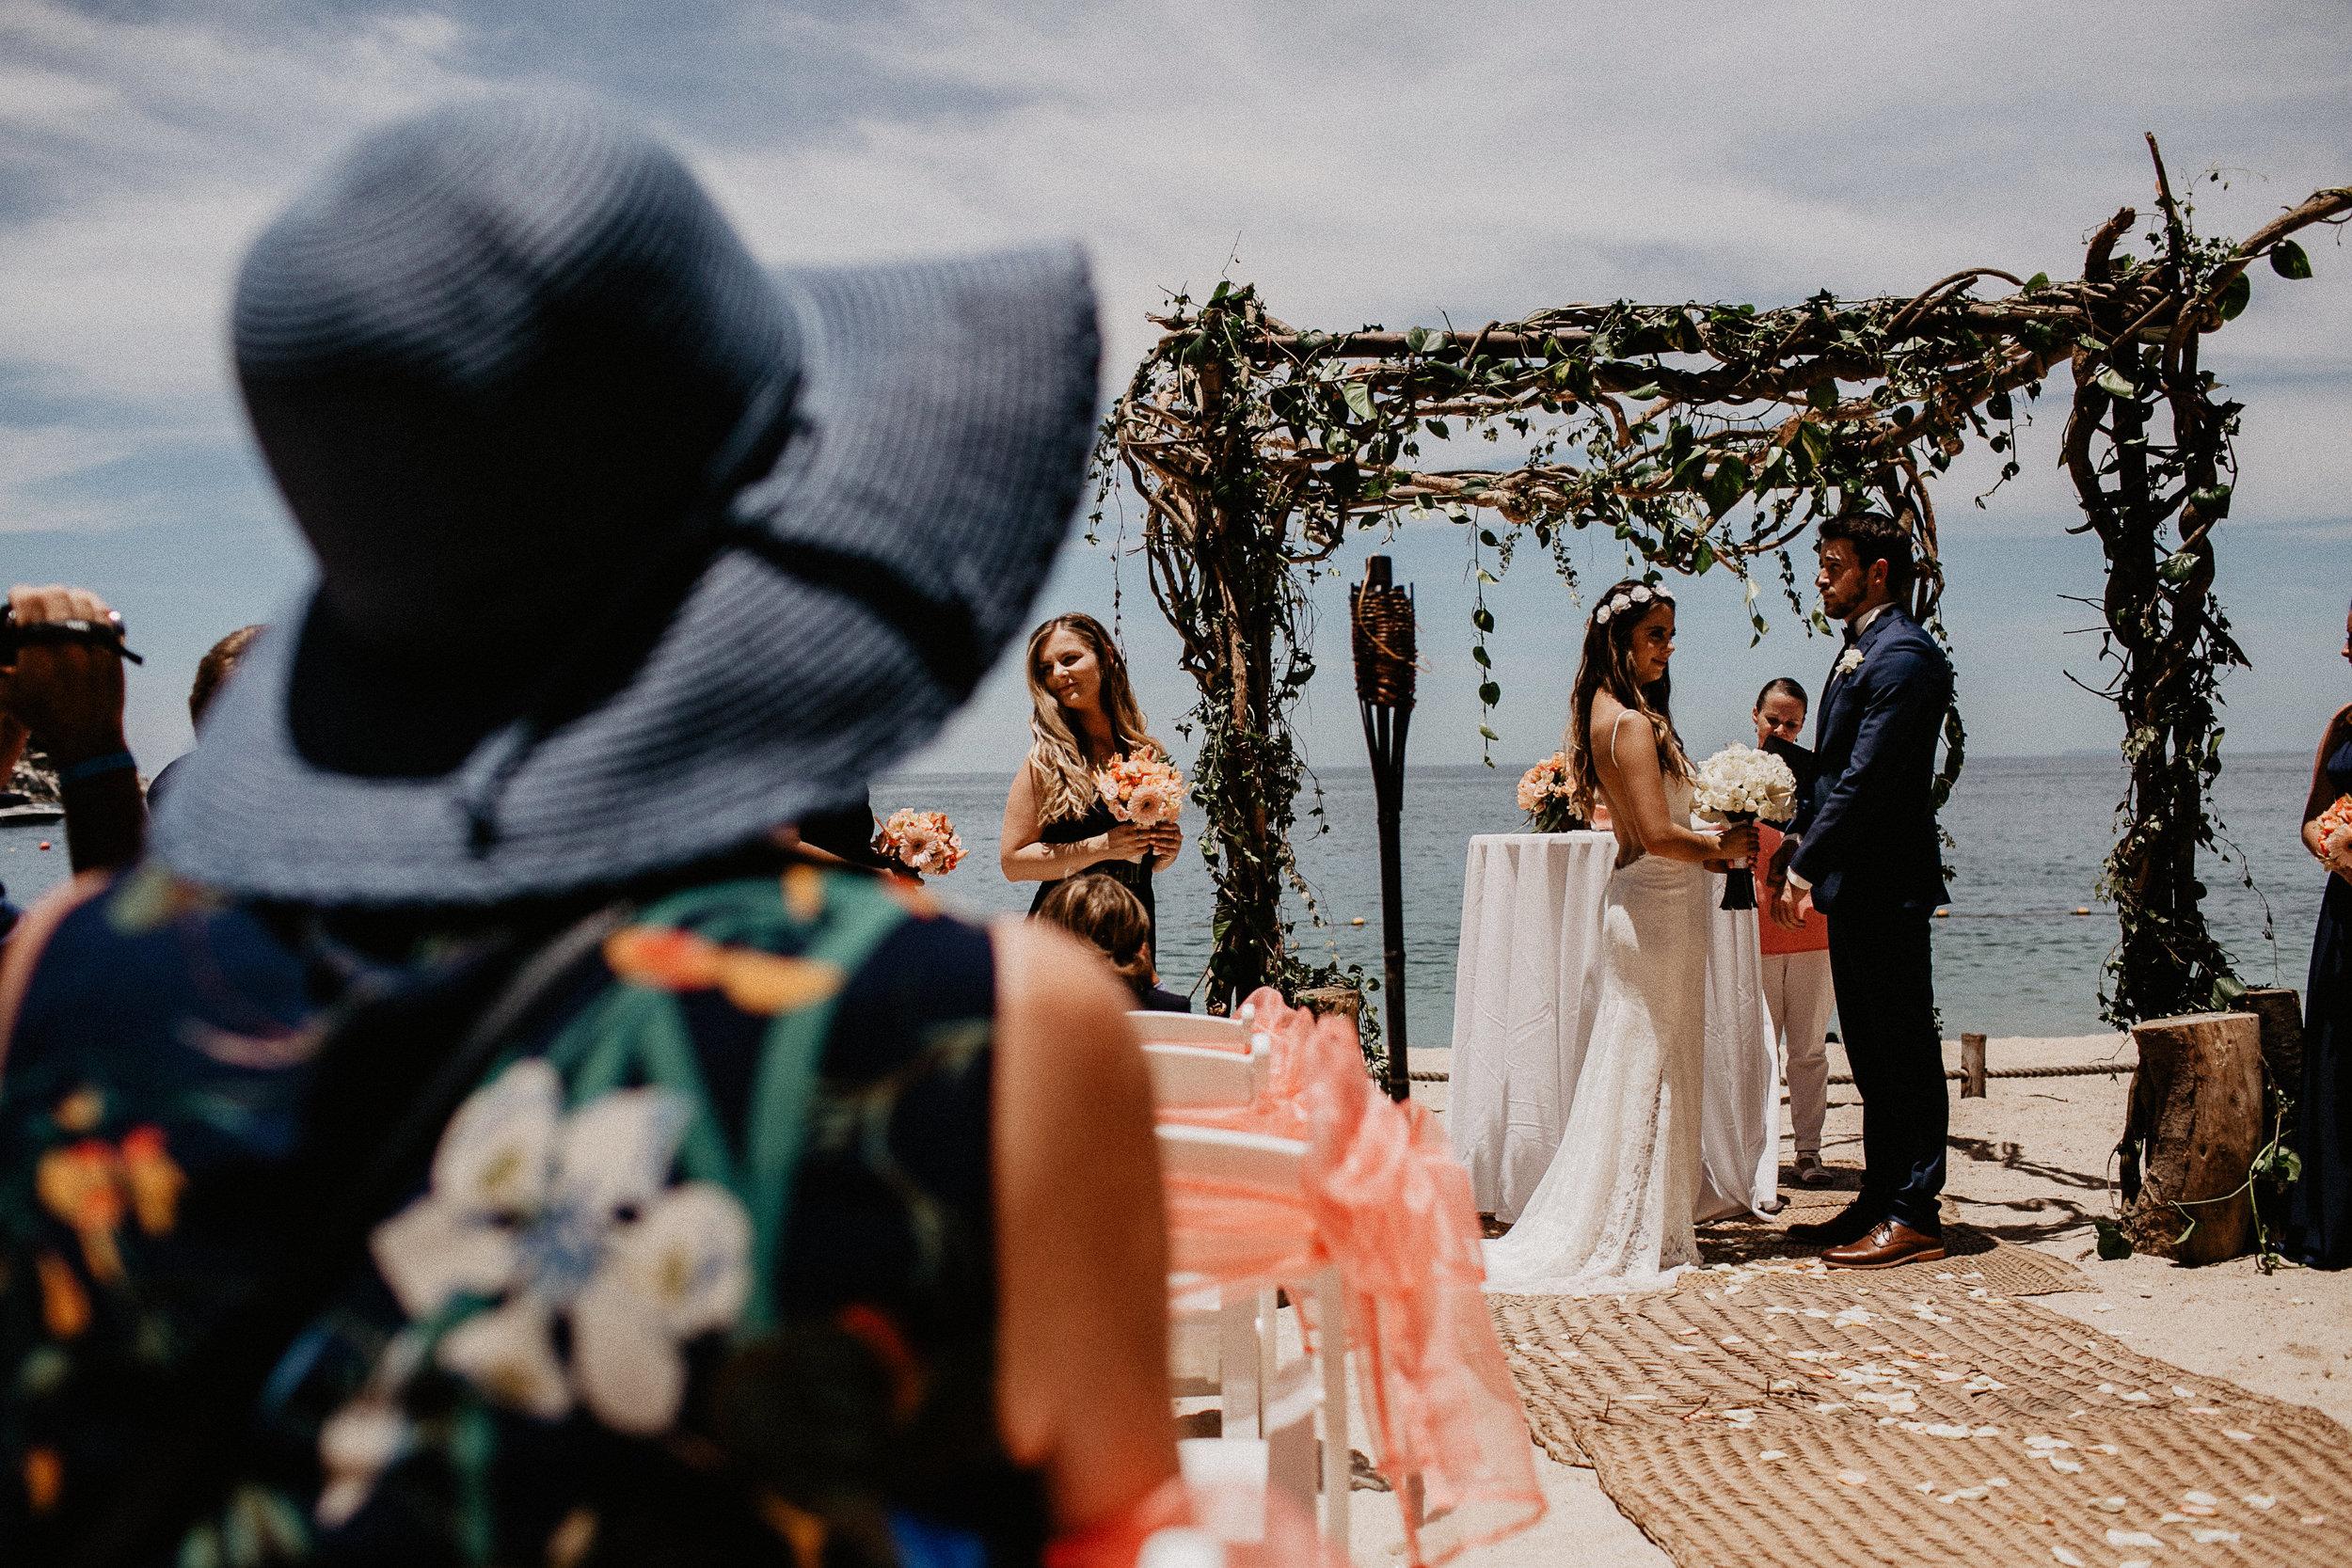 alfonso_flores_destination_wedding_photography_puerto_vallarta_hotel_barcelo_vallarta_cuttler_amela-224.JPG